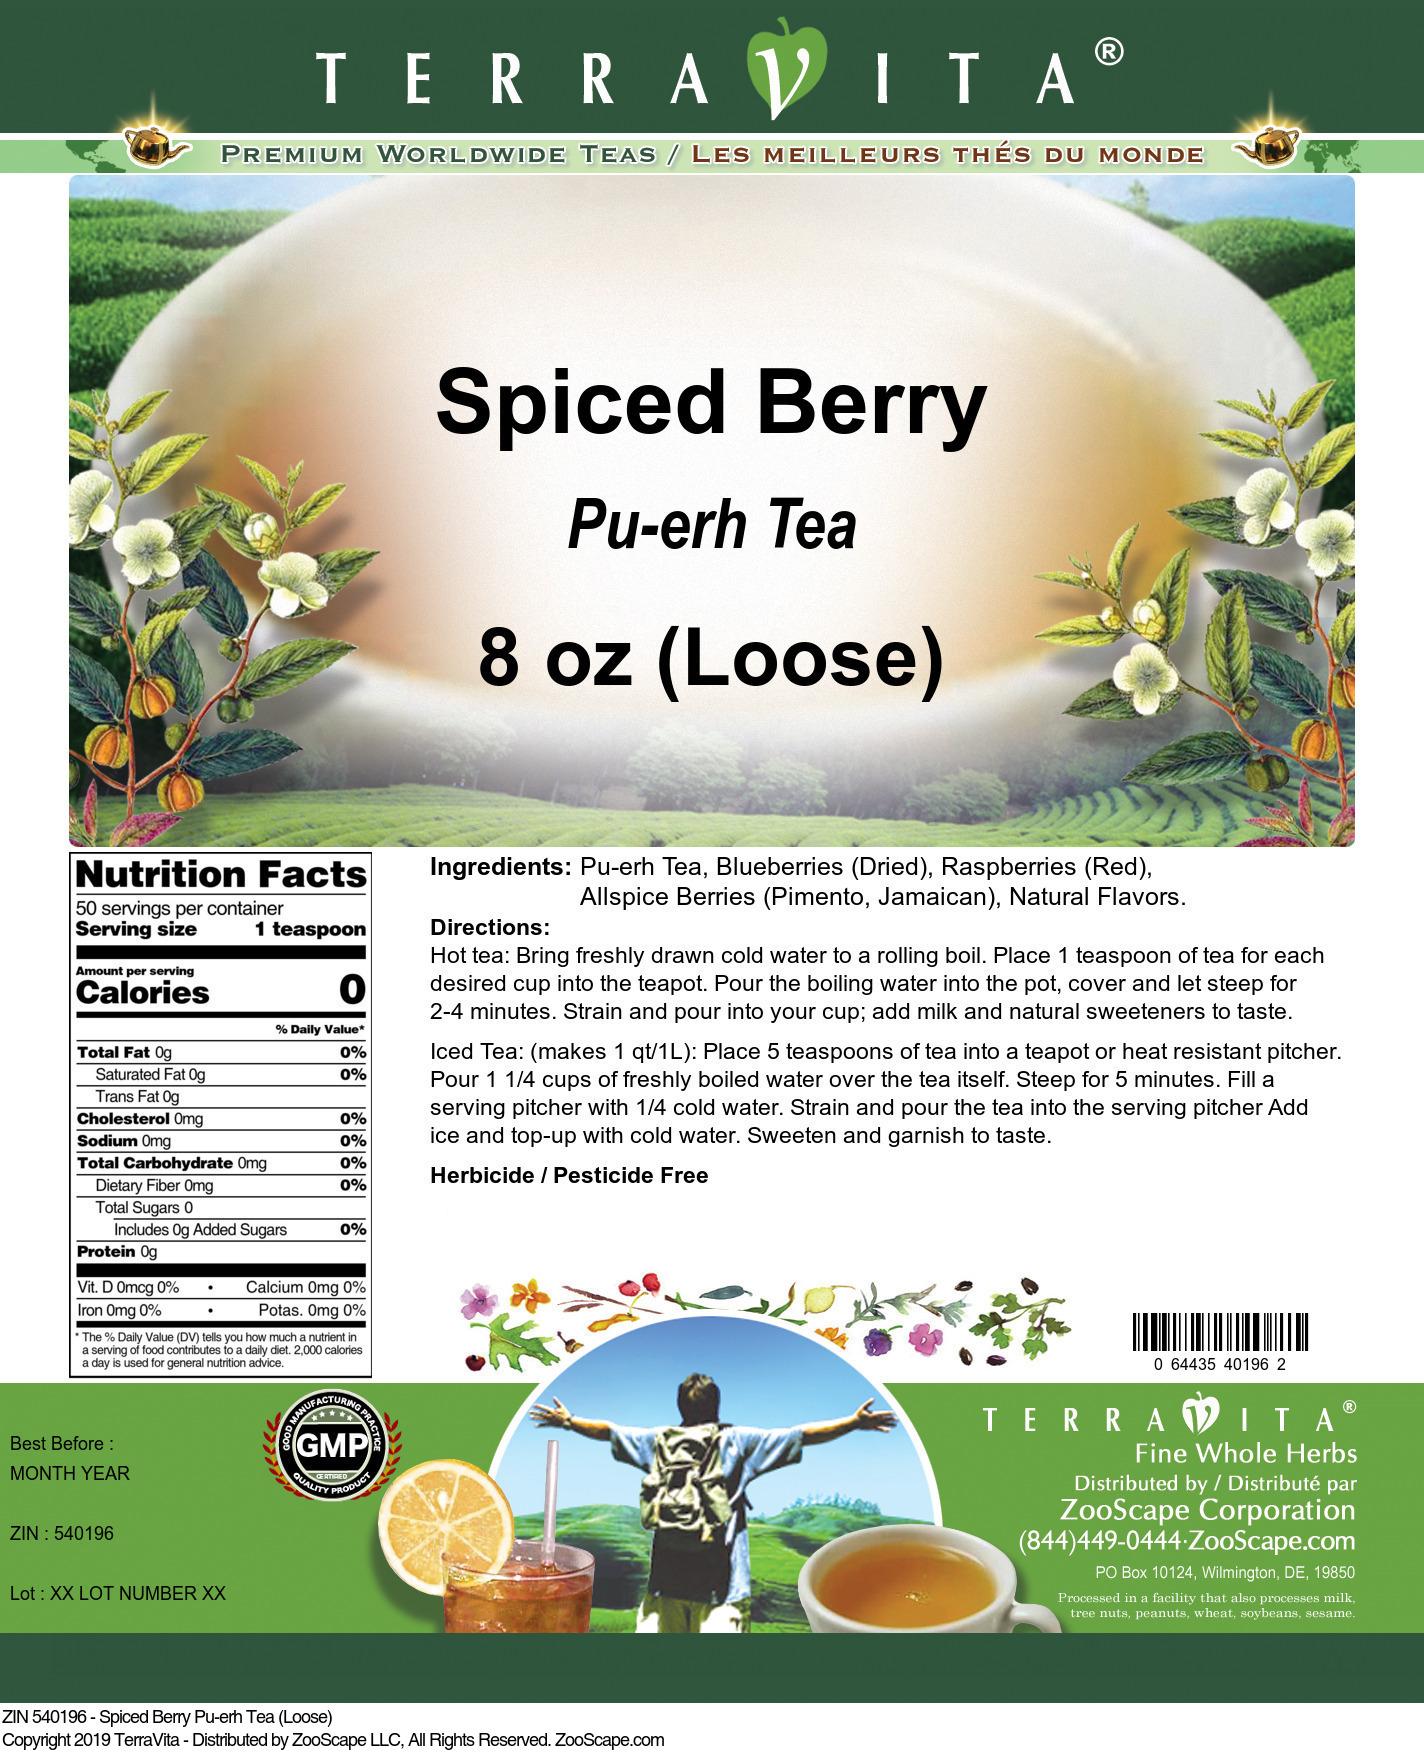 Spiced Berry Pu-erh Tea